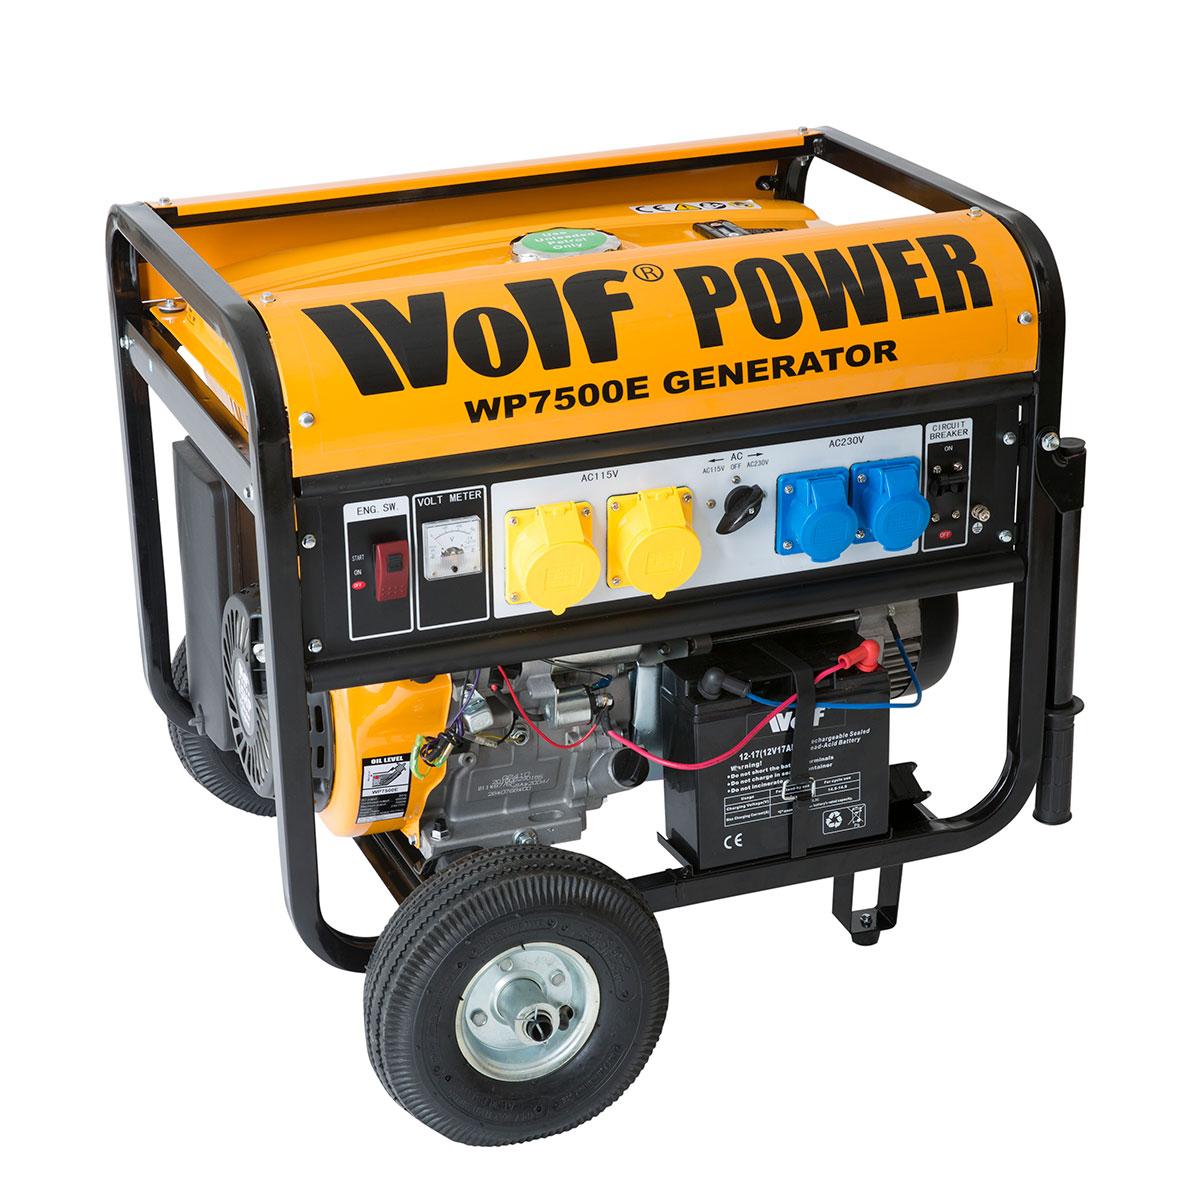 wolf 7000w petrol generator with electric start system ukhs tv rh ukhs tv Generator Plug Wiring Diagram Portable Generator Wiring Diagram